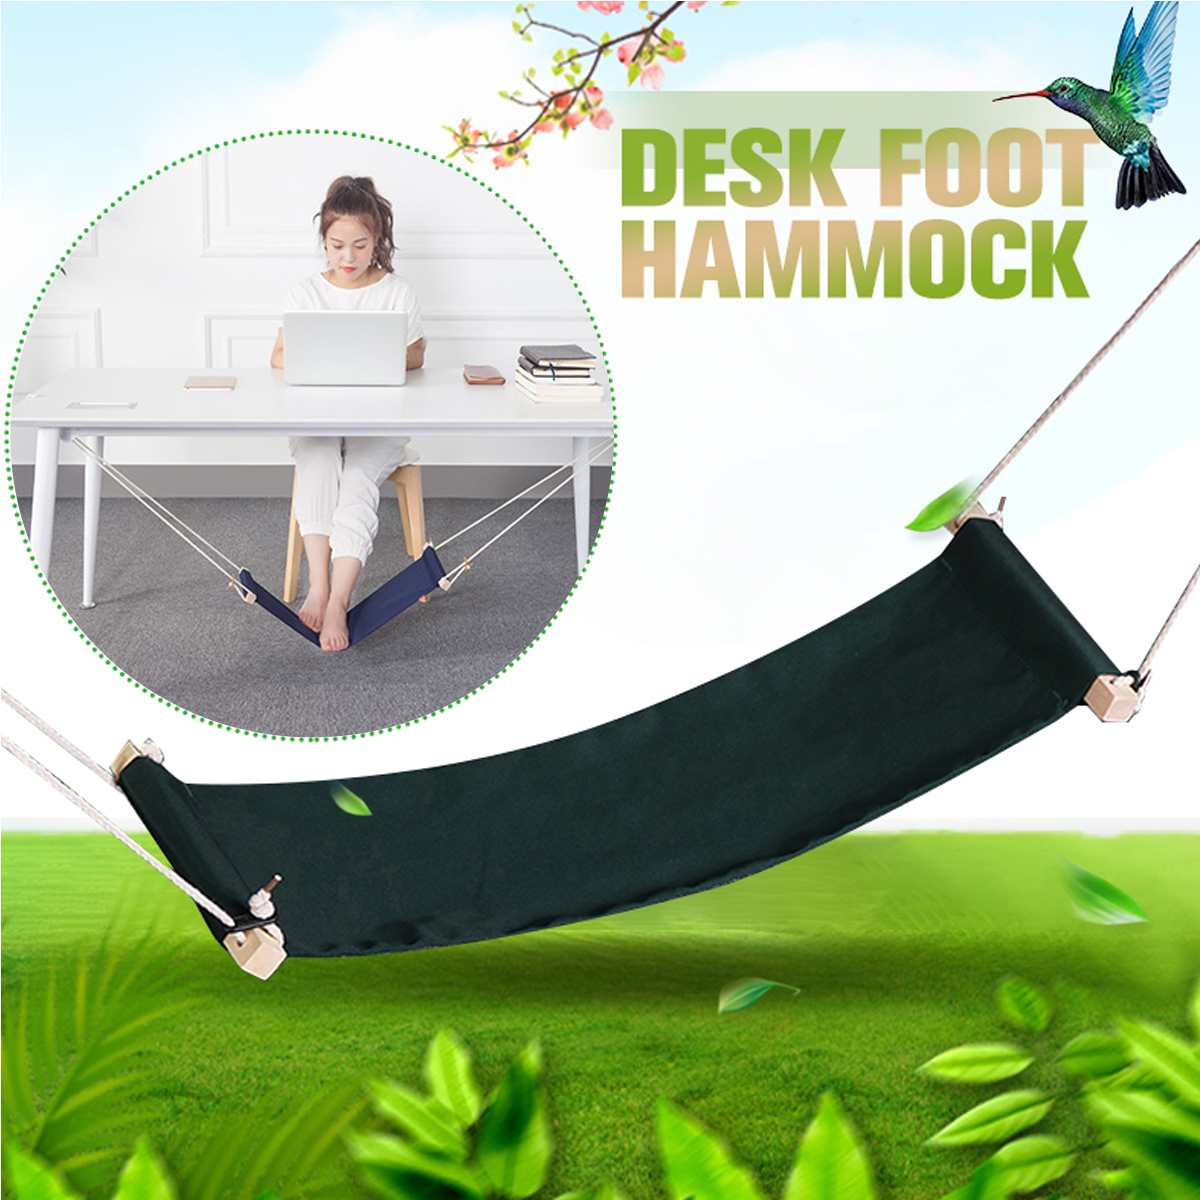 The Welfare Of Leisure Home Office Adjustable Foot Rest Desk Feet Hammock Surfing The Internet Hobbies Outdoor Rest